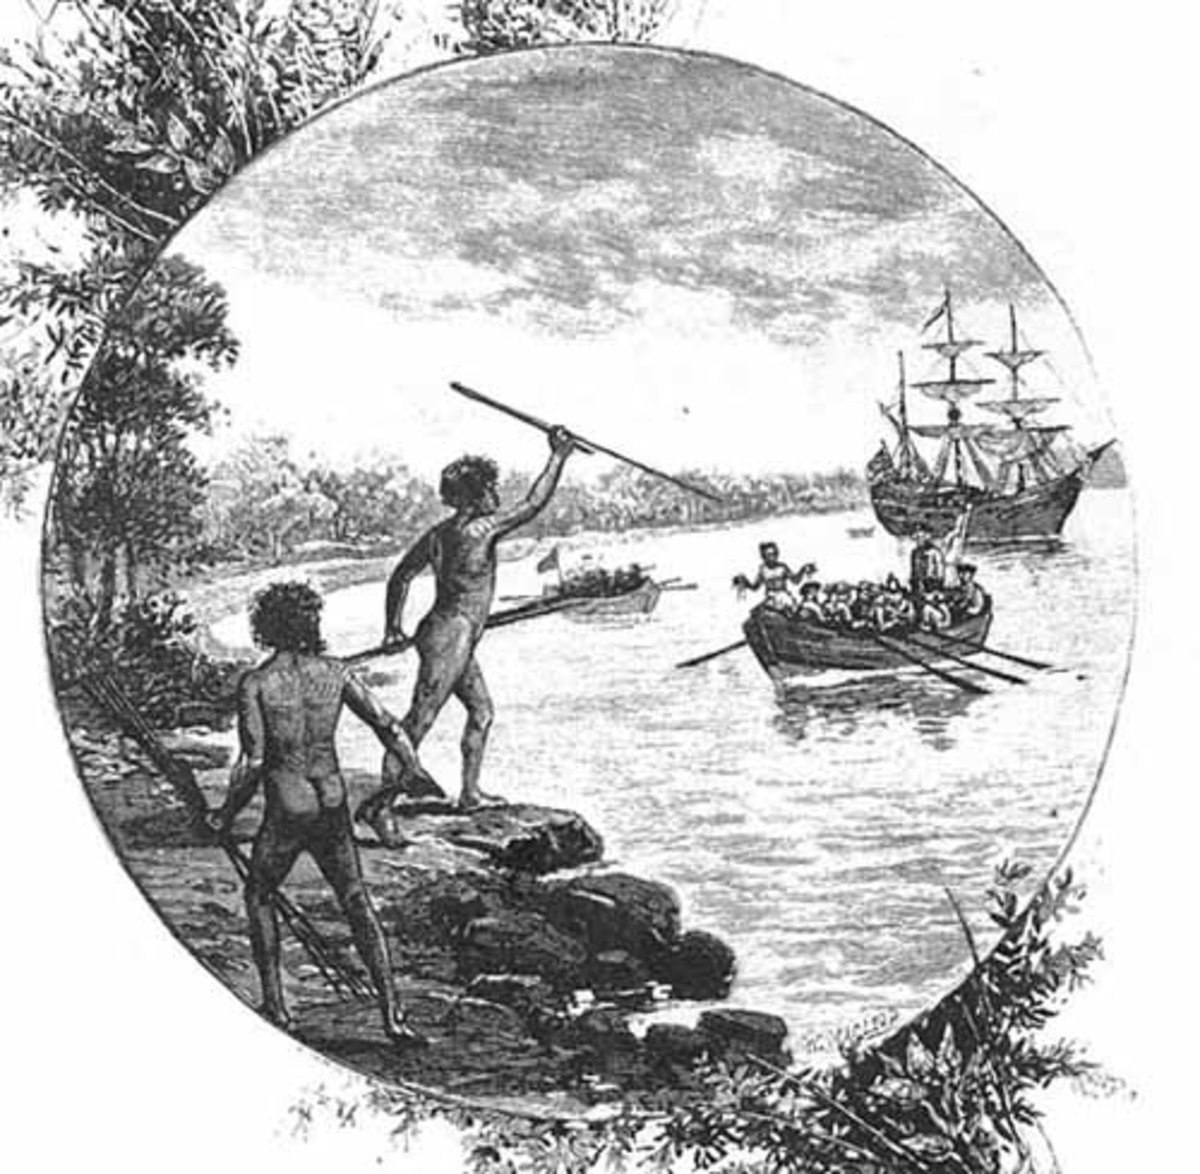 Aboriginals Watch The First Fleet arrive